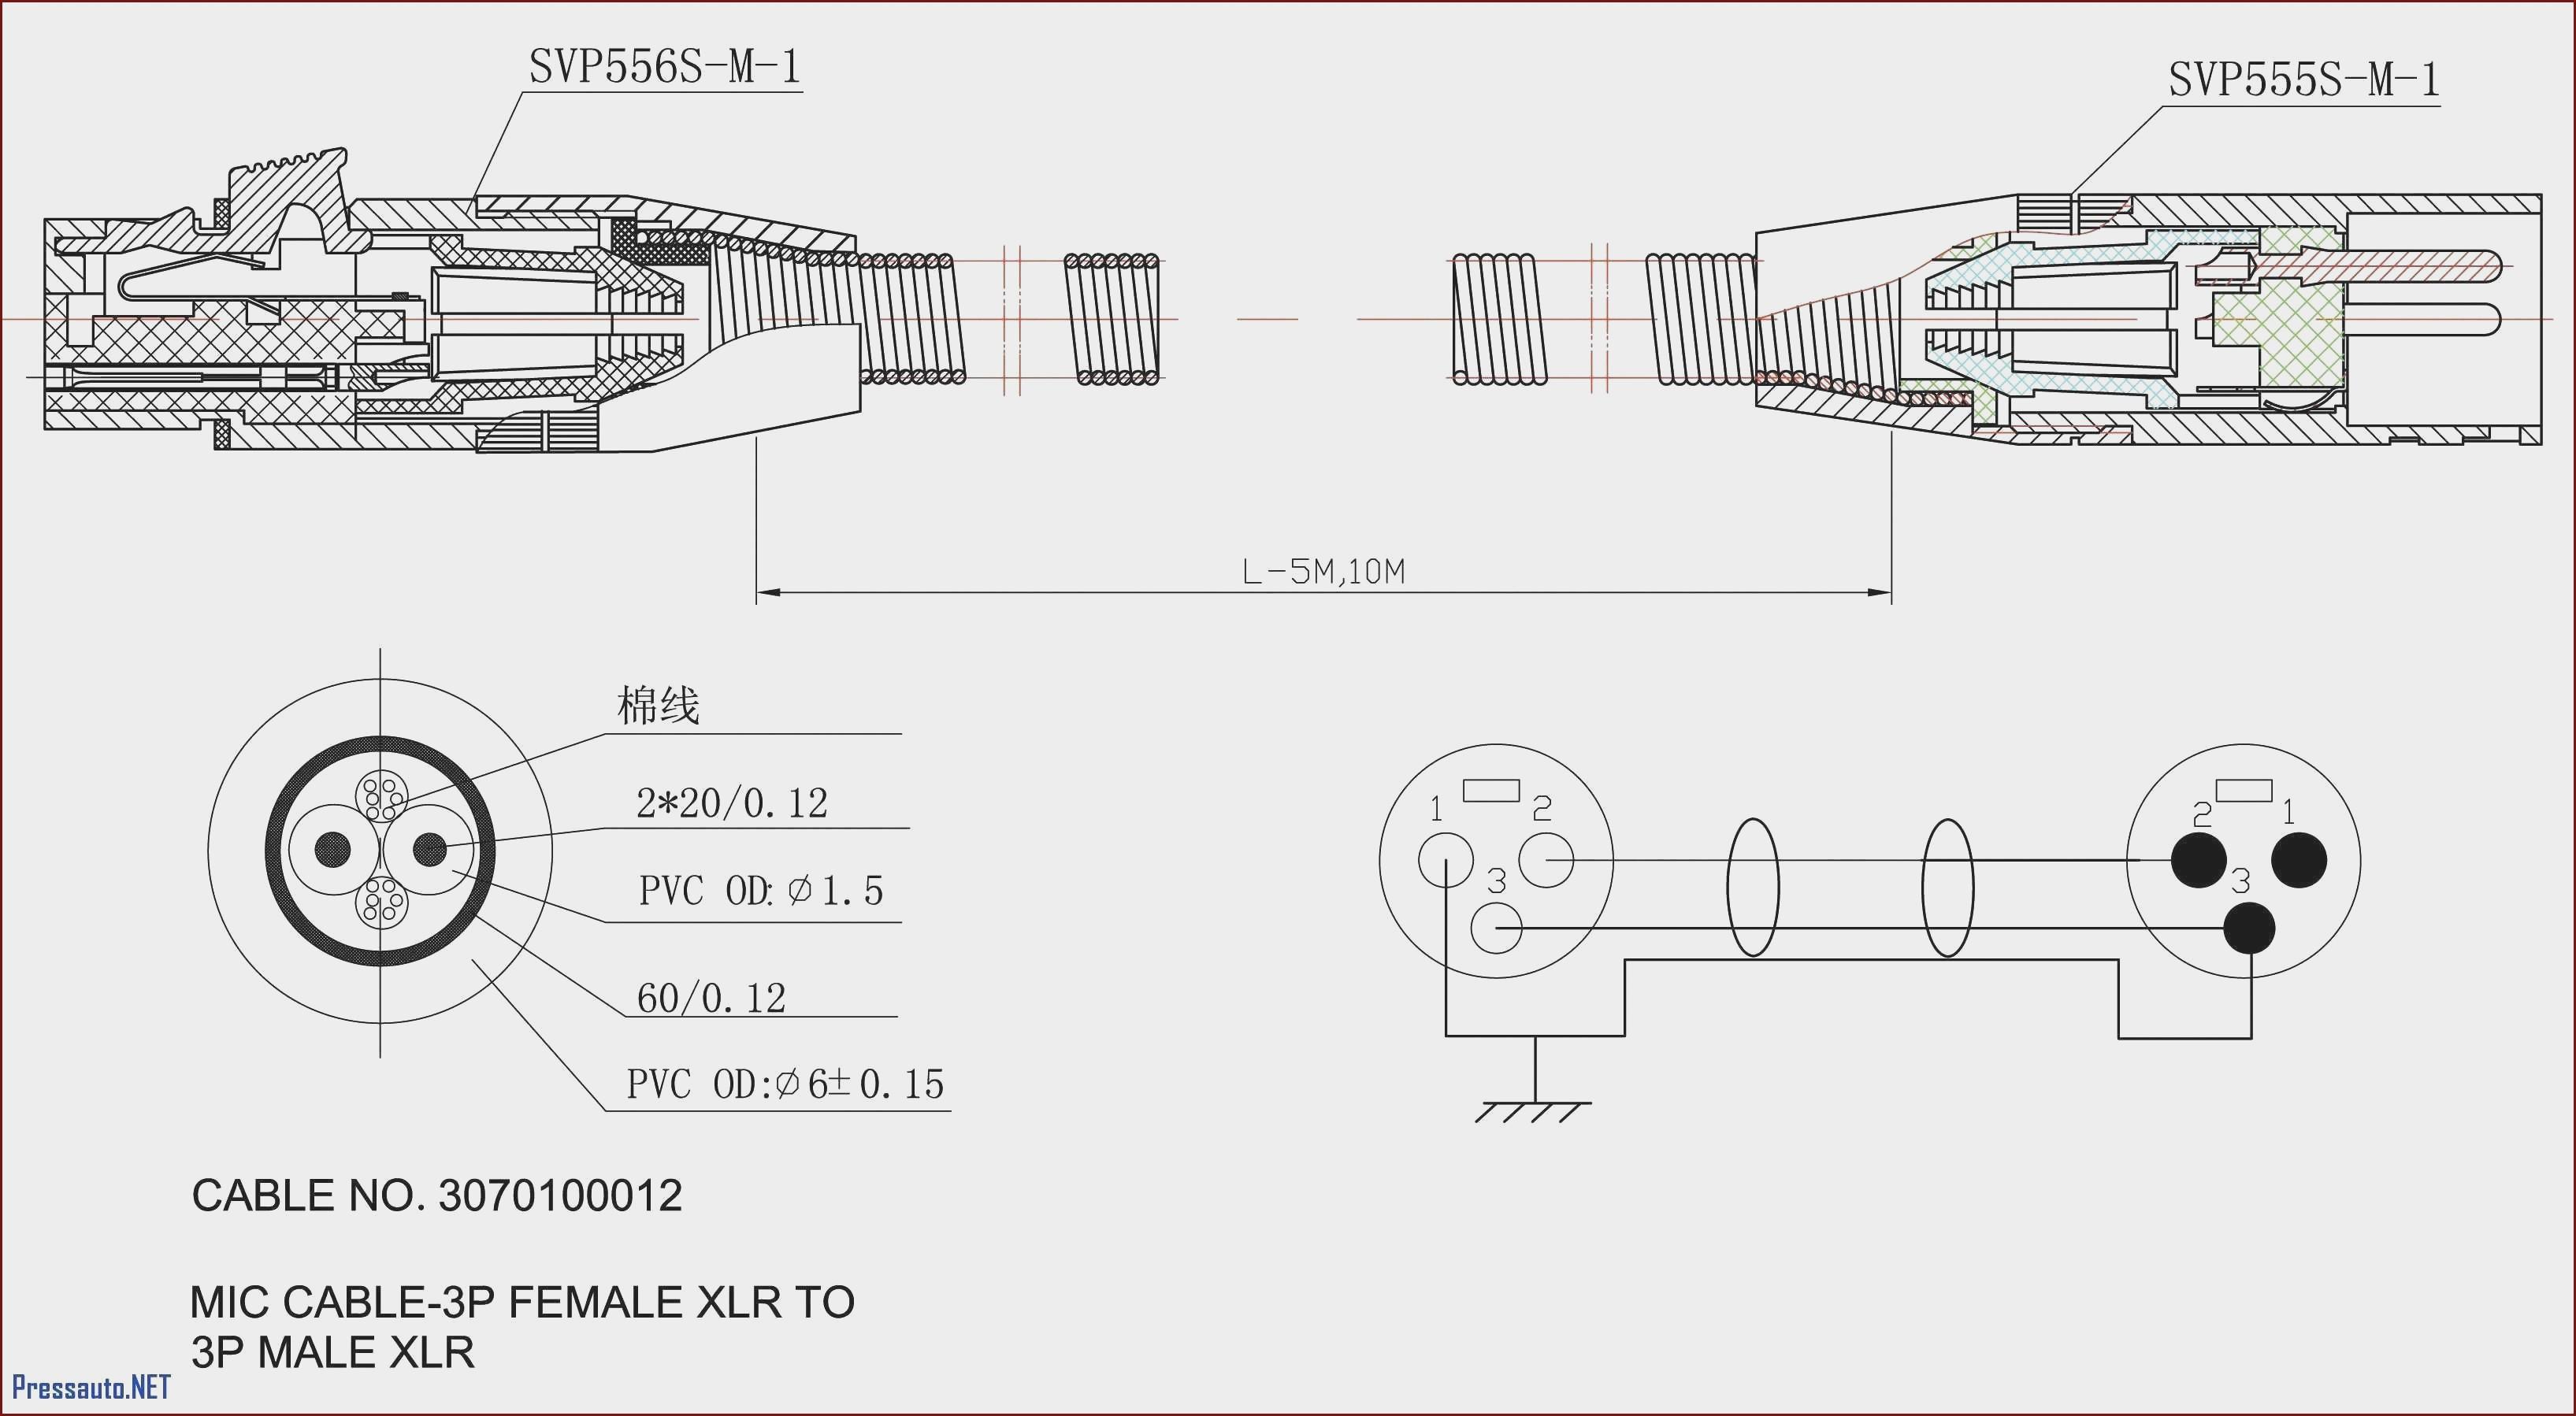 Cargo Trailer Wiring Diagram Hudson Trailer Wiring Diagram at Manuals Library Of Cargo Trailer Wiring Diagram